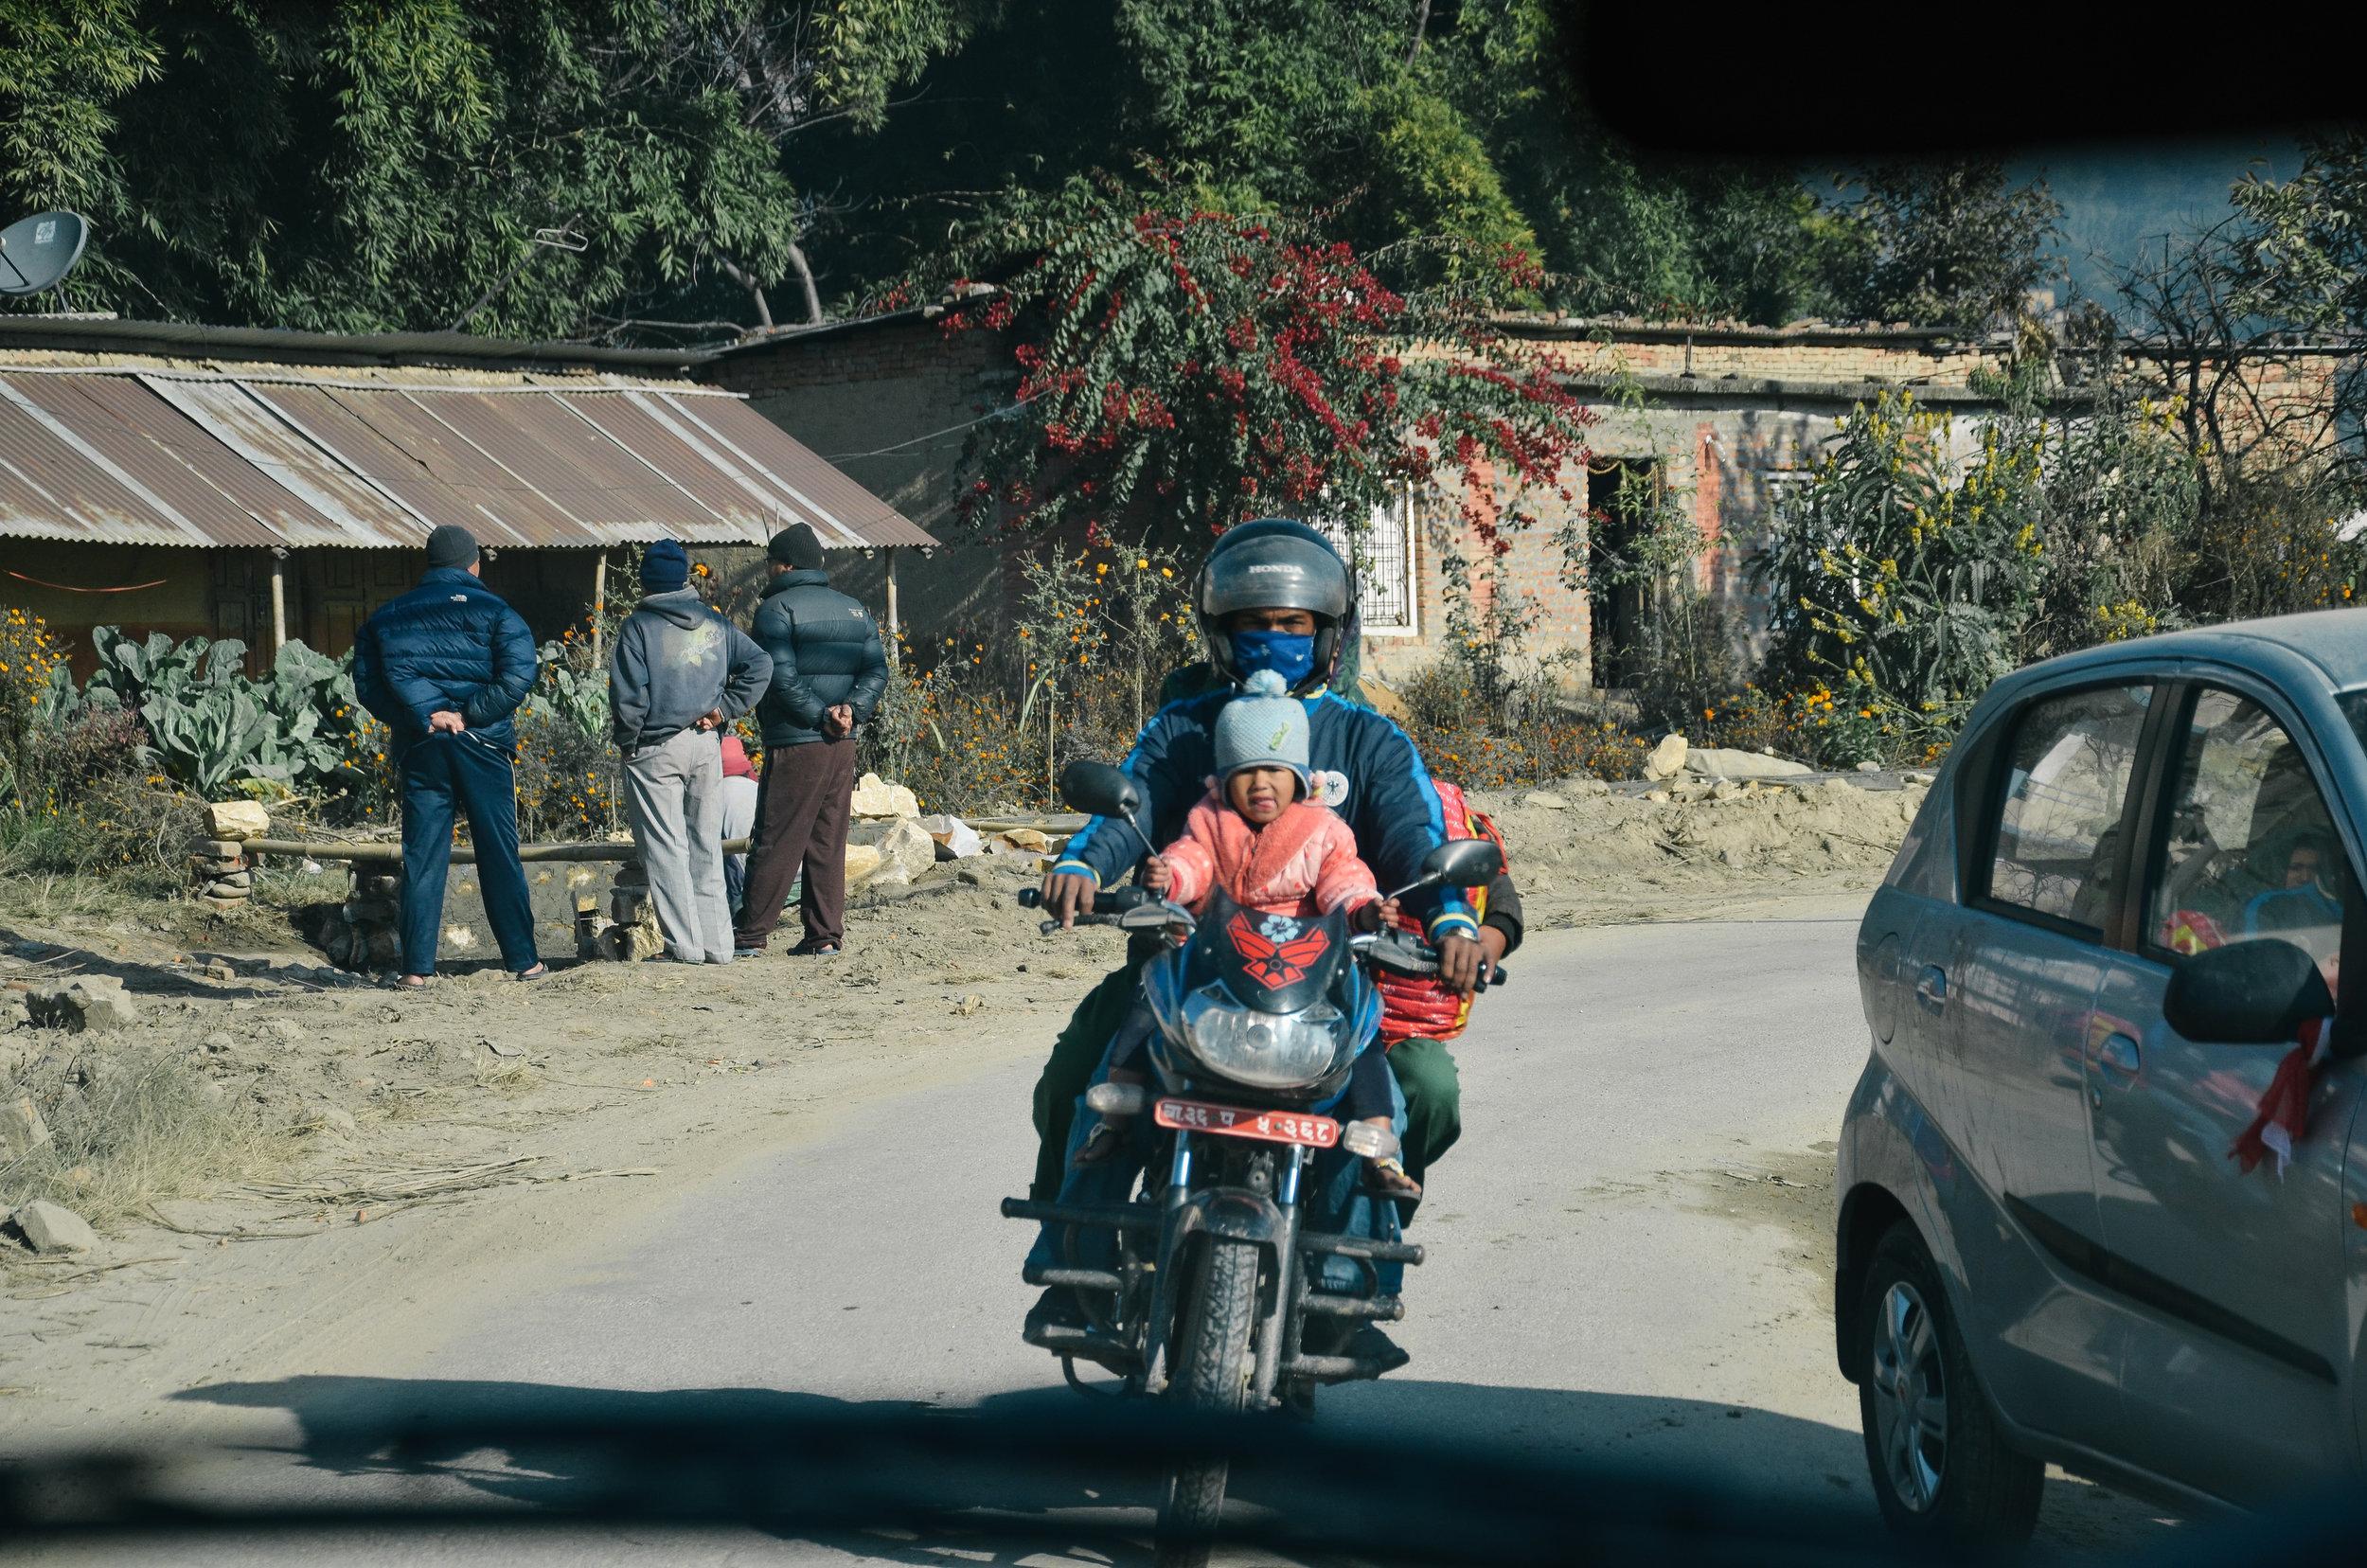 10-things-to-know-kathmandu-nepal-lifeonpine_DSC_0568.jpg